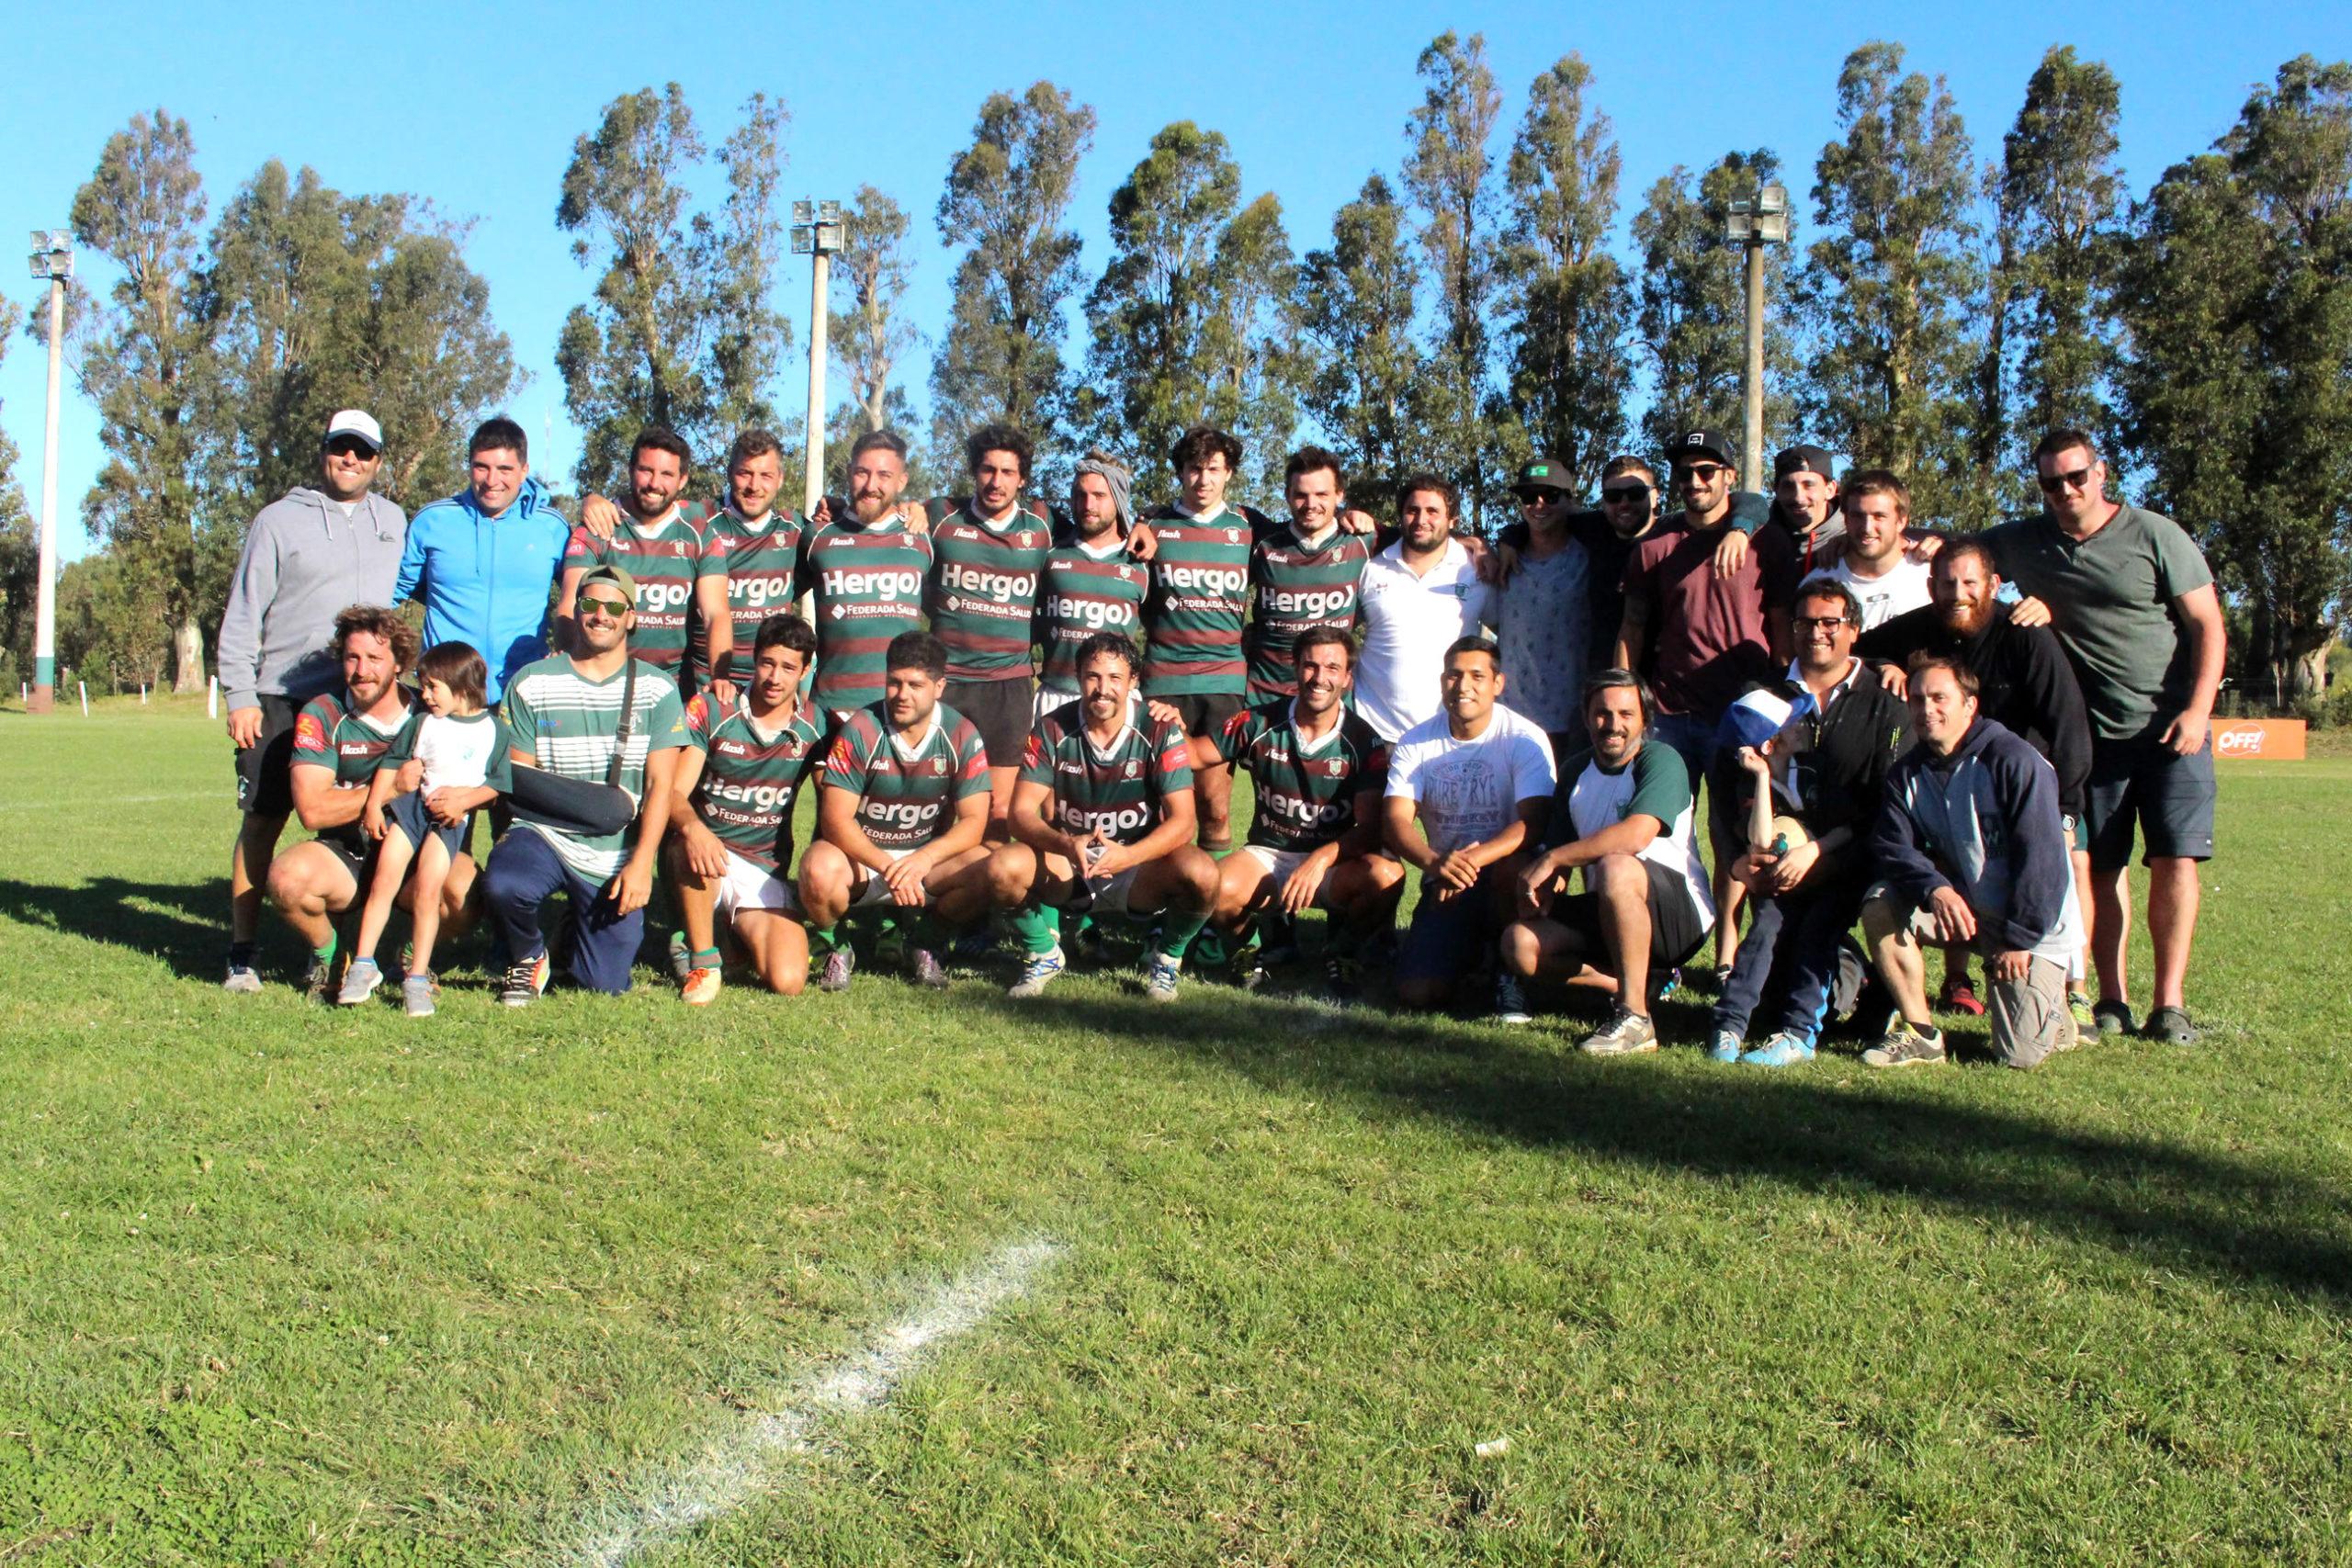 El plantel de Mar del Plata Club que se coronó campeón (Foto: Prensa URMDP)